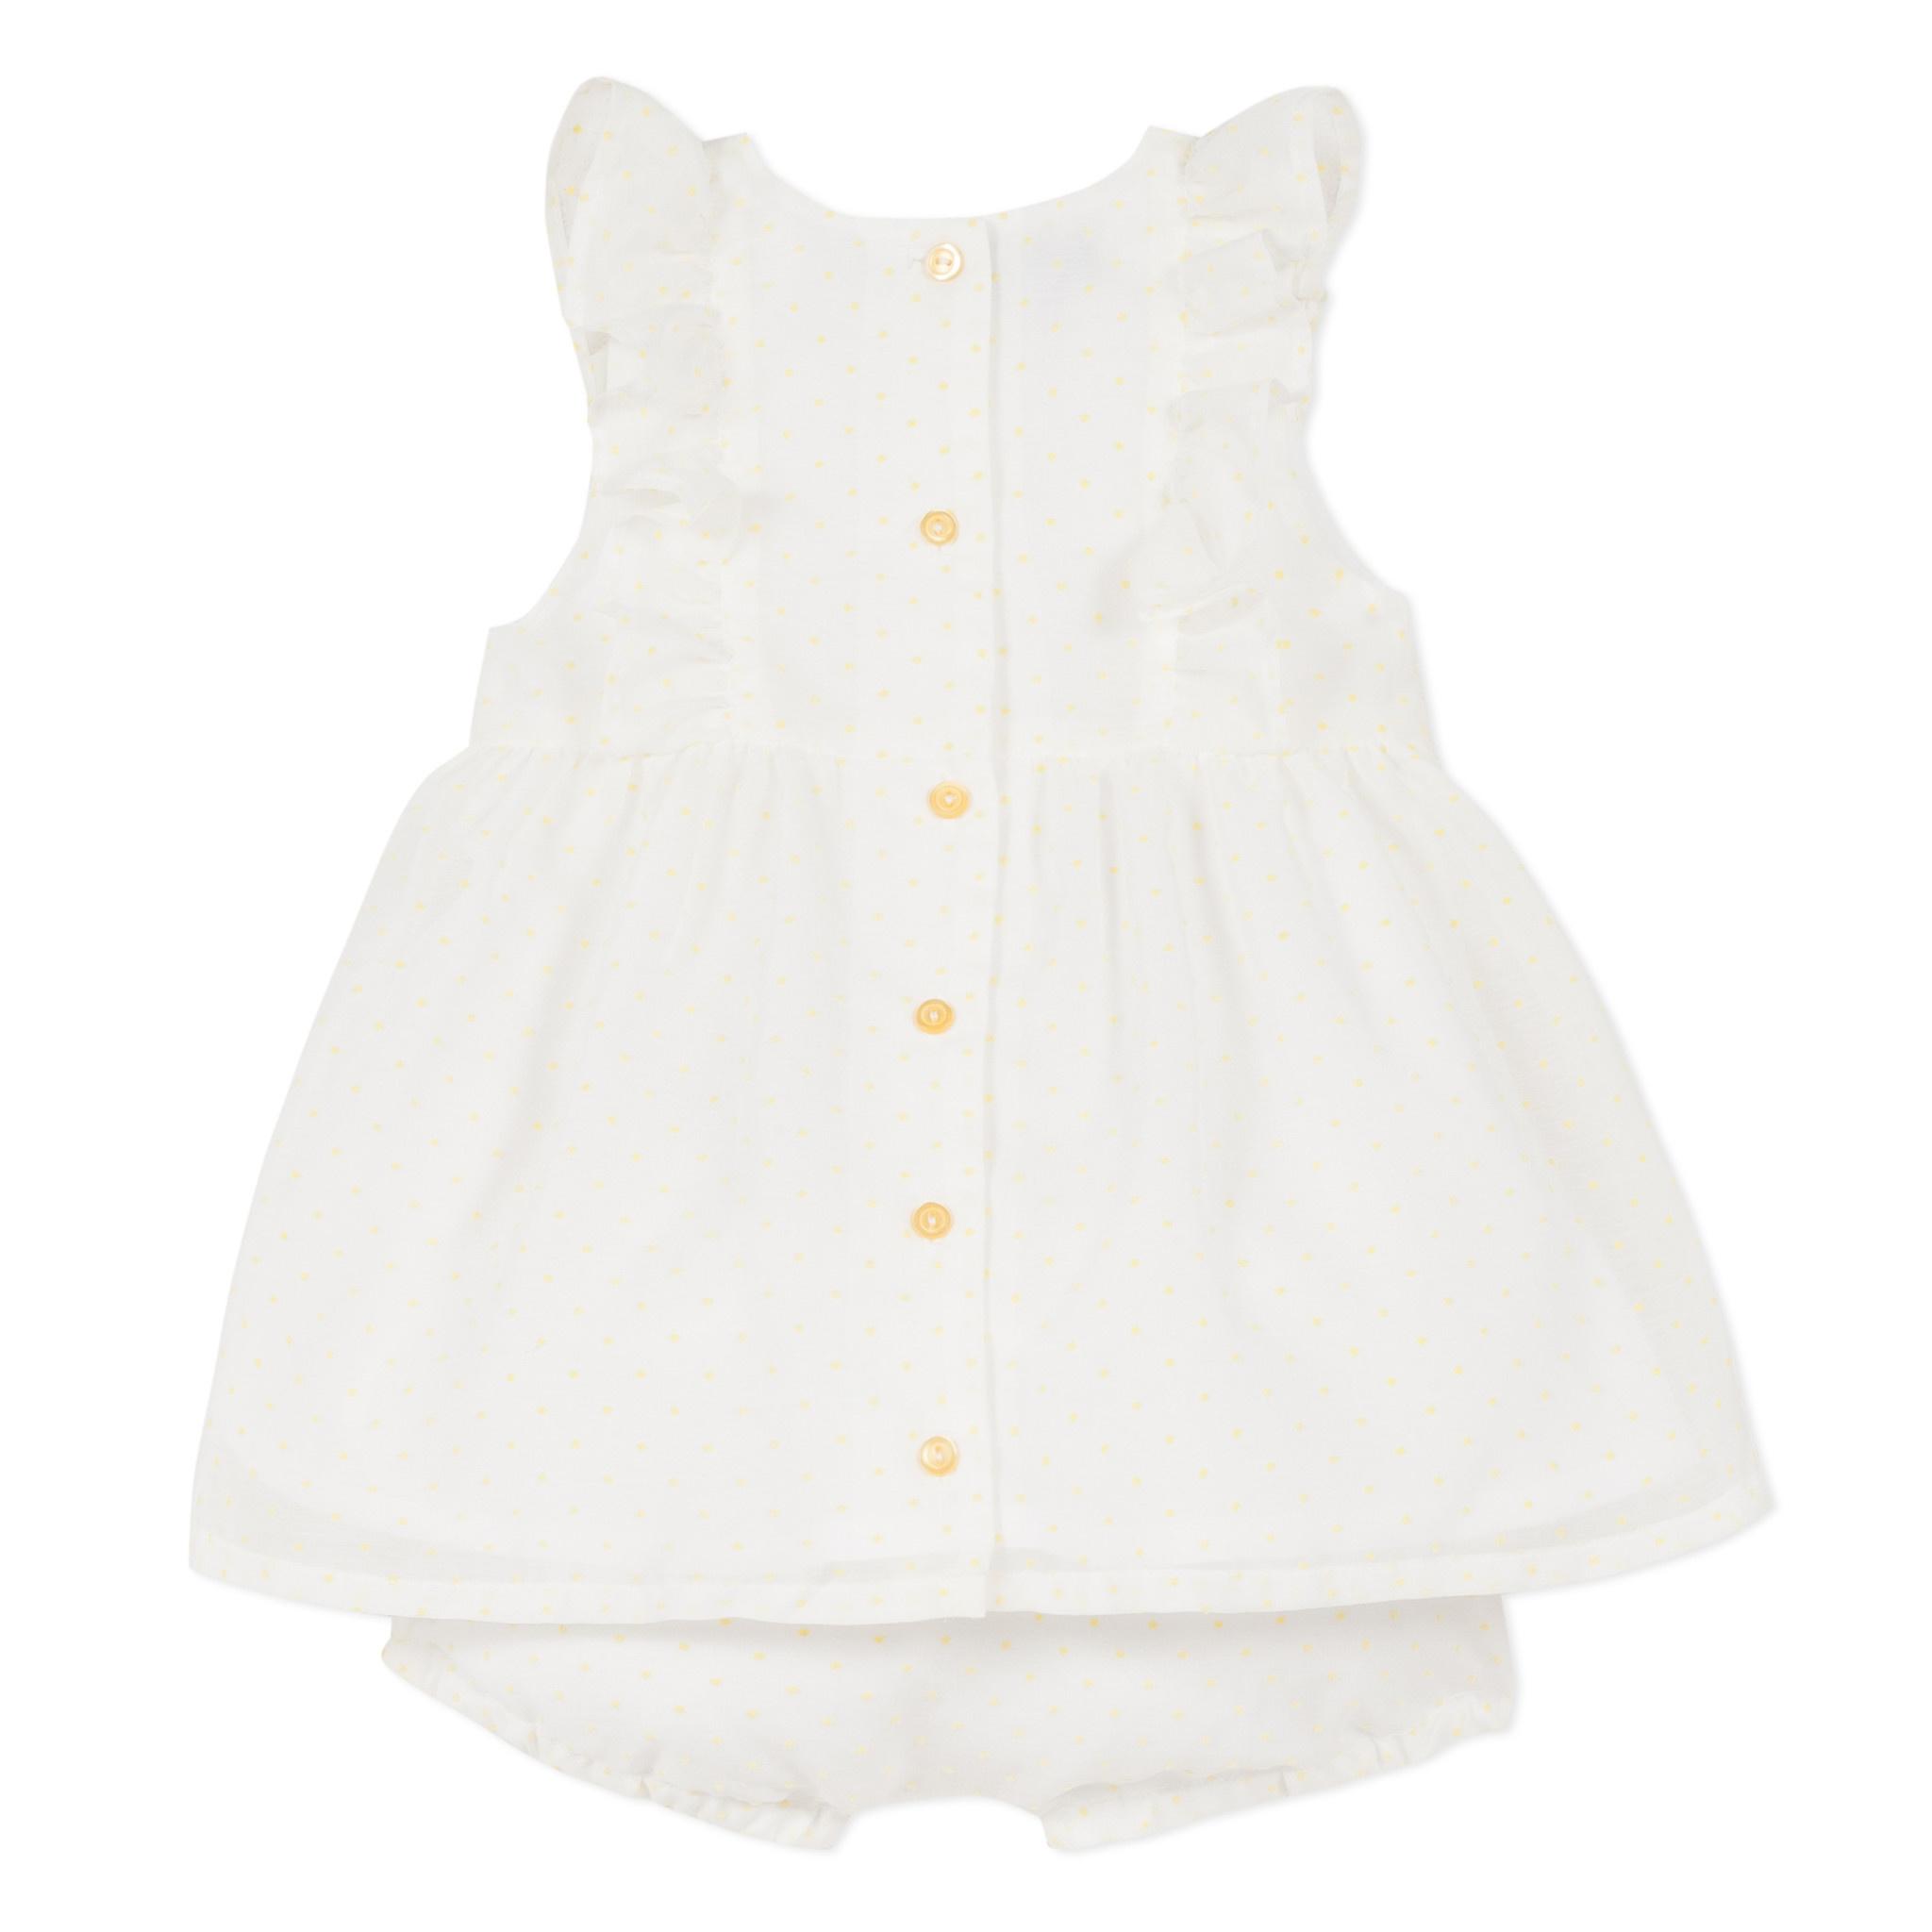 Absorba Absorba Yellow Dot Two Piece Dress & Pants